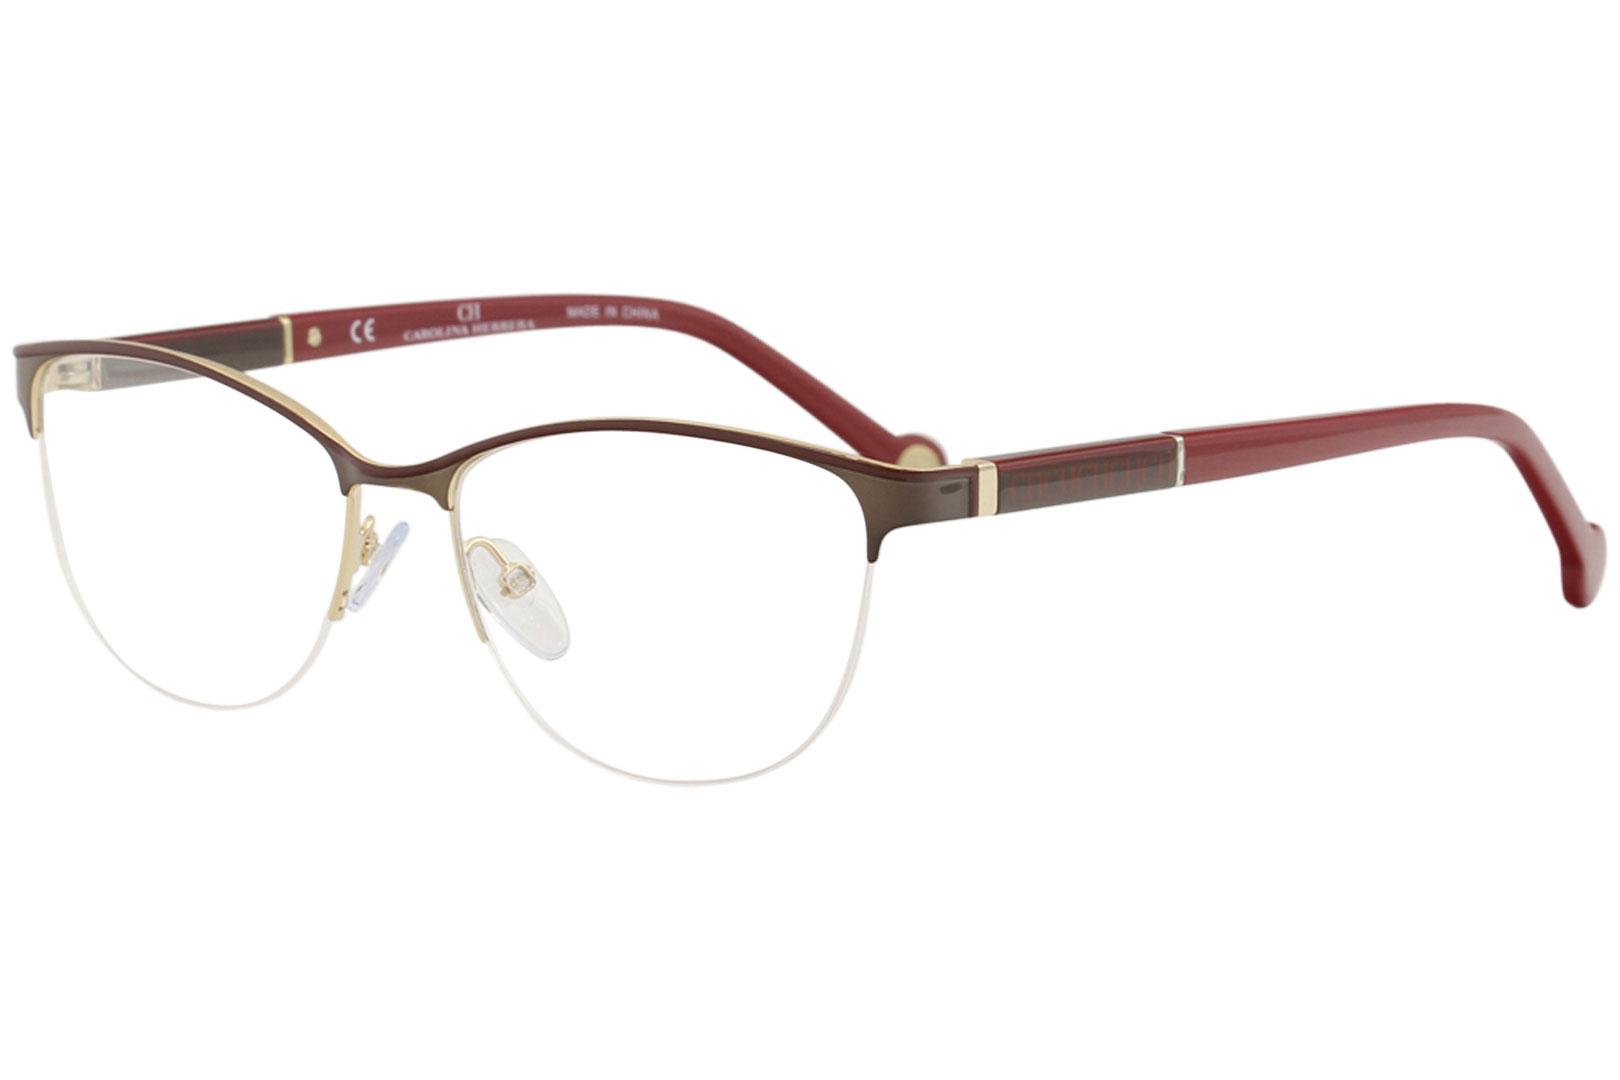 c543e7c601 CH Carolina Herrera Eyeglasses VHE079K VHE 079 K 0SB1 Brown Optical ...